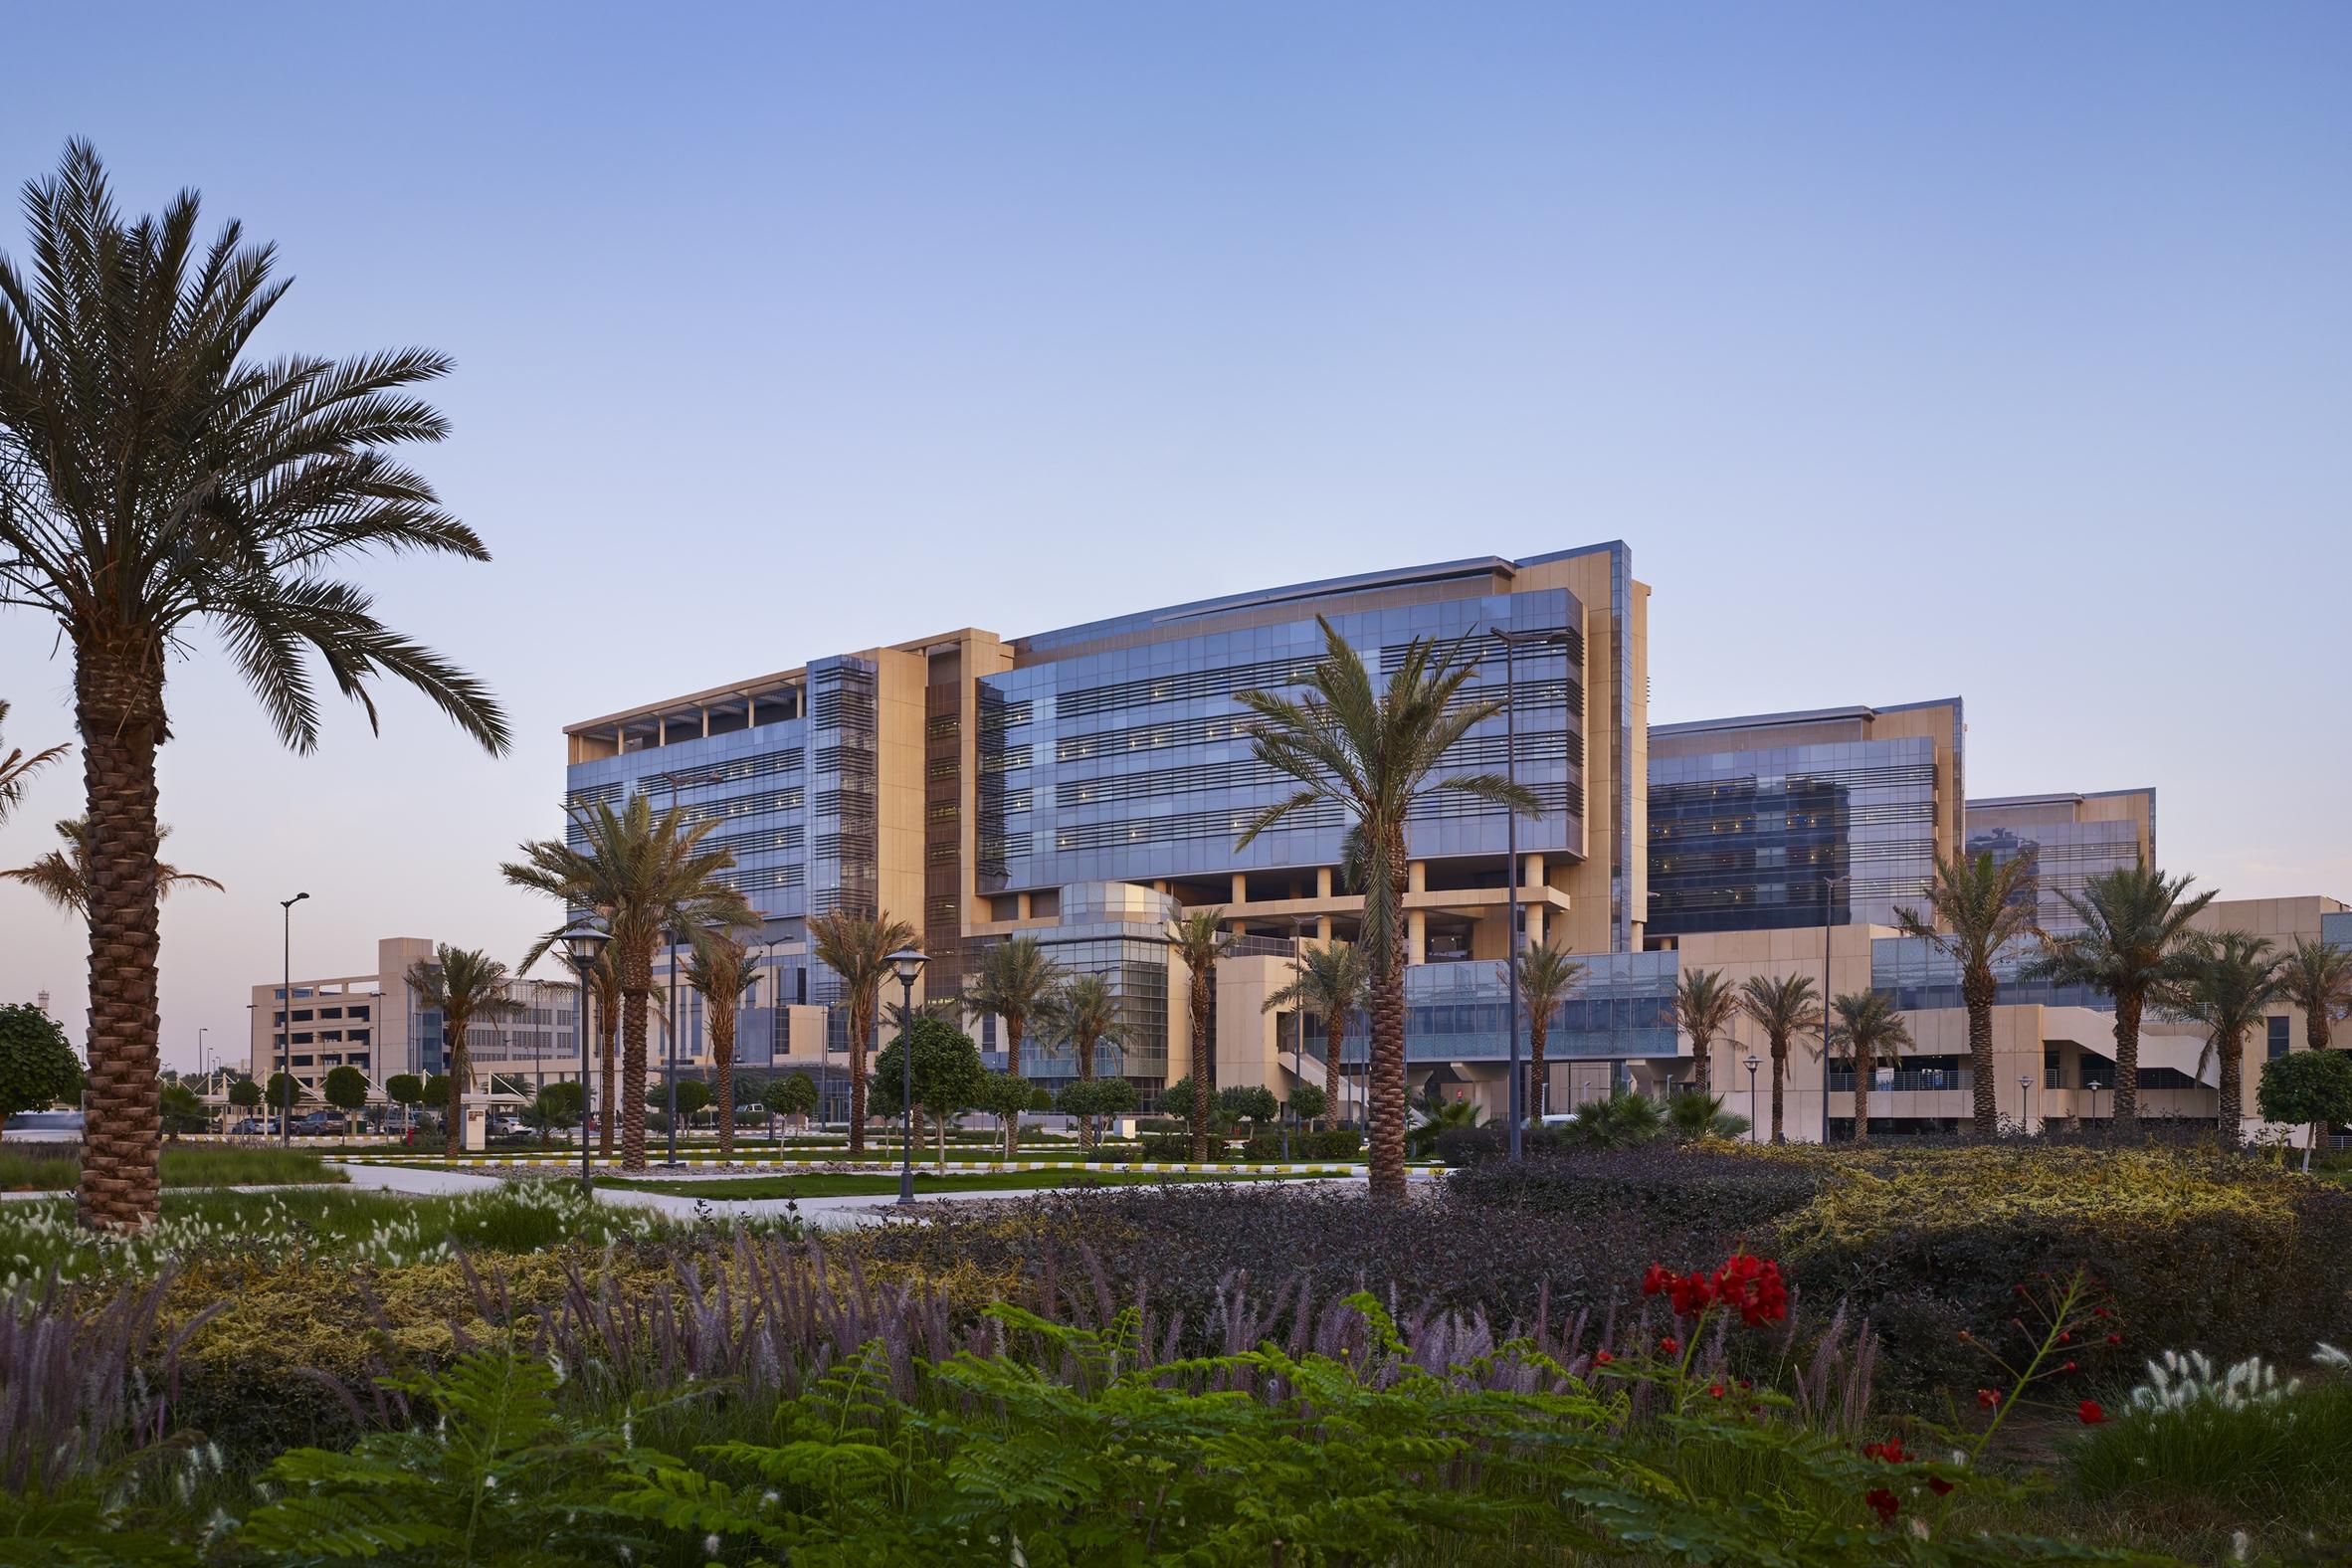 King Abdullah Specialist Children Hospital